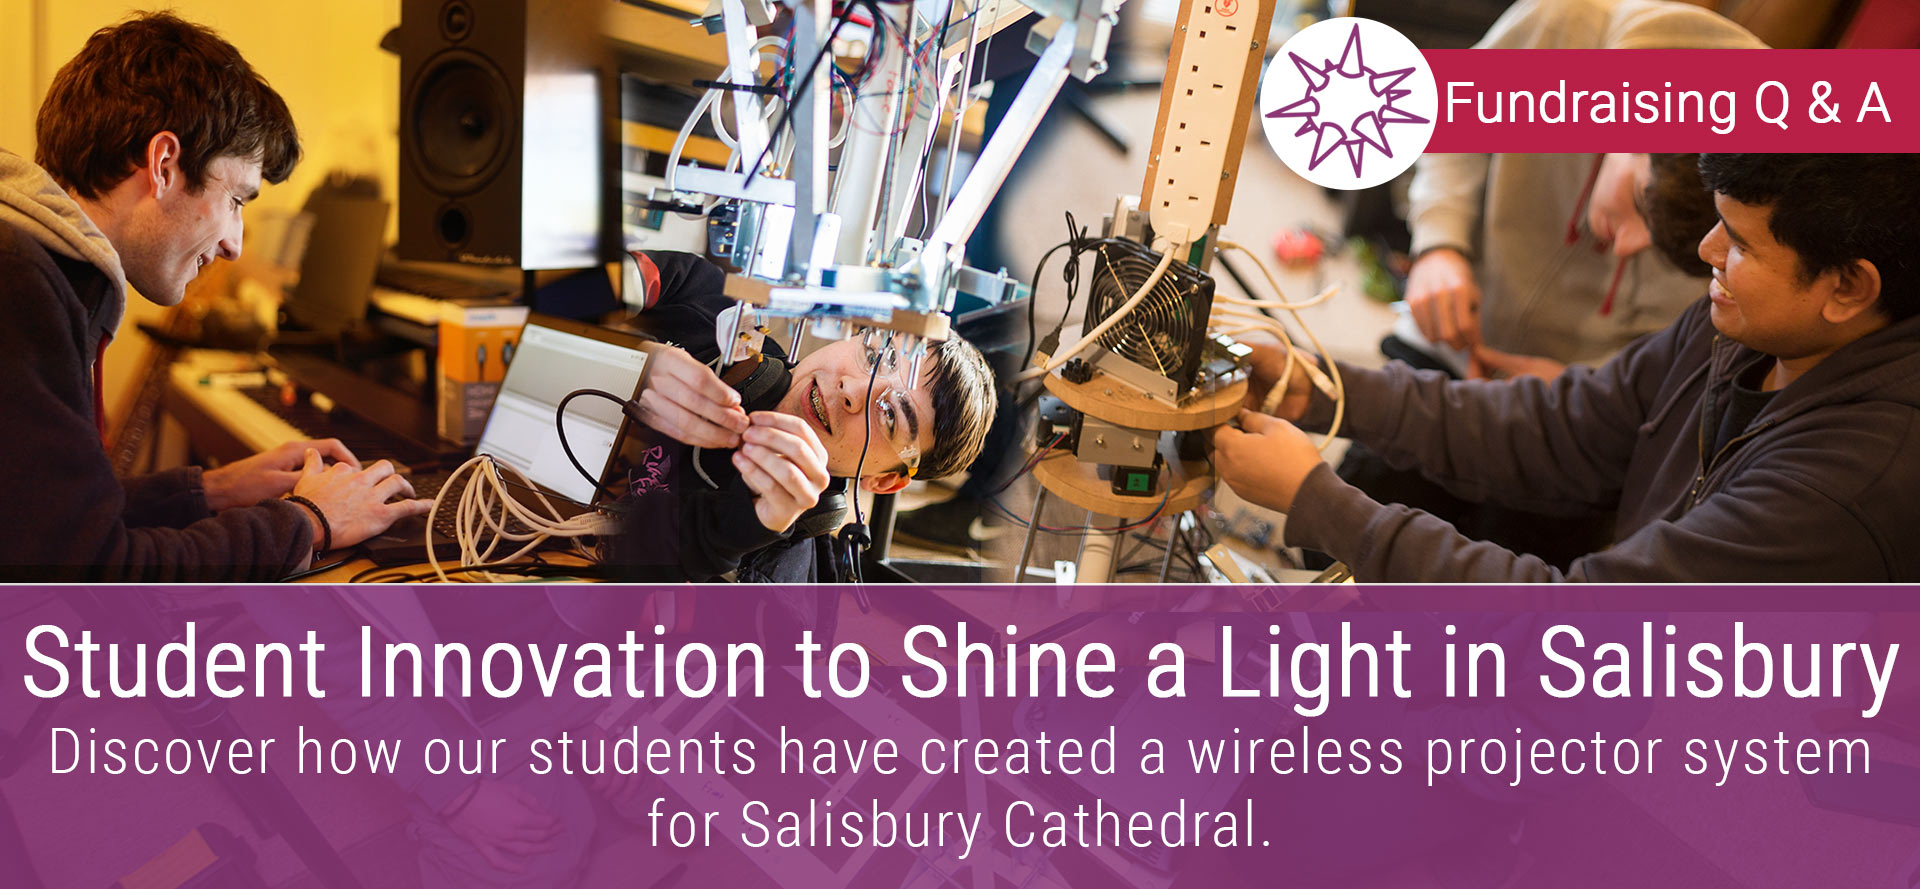 Student Innovation Shines A Light in Salisbury